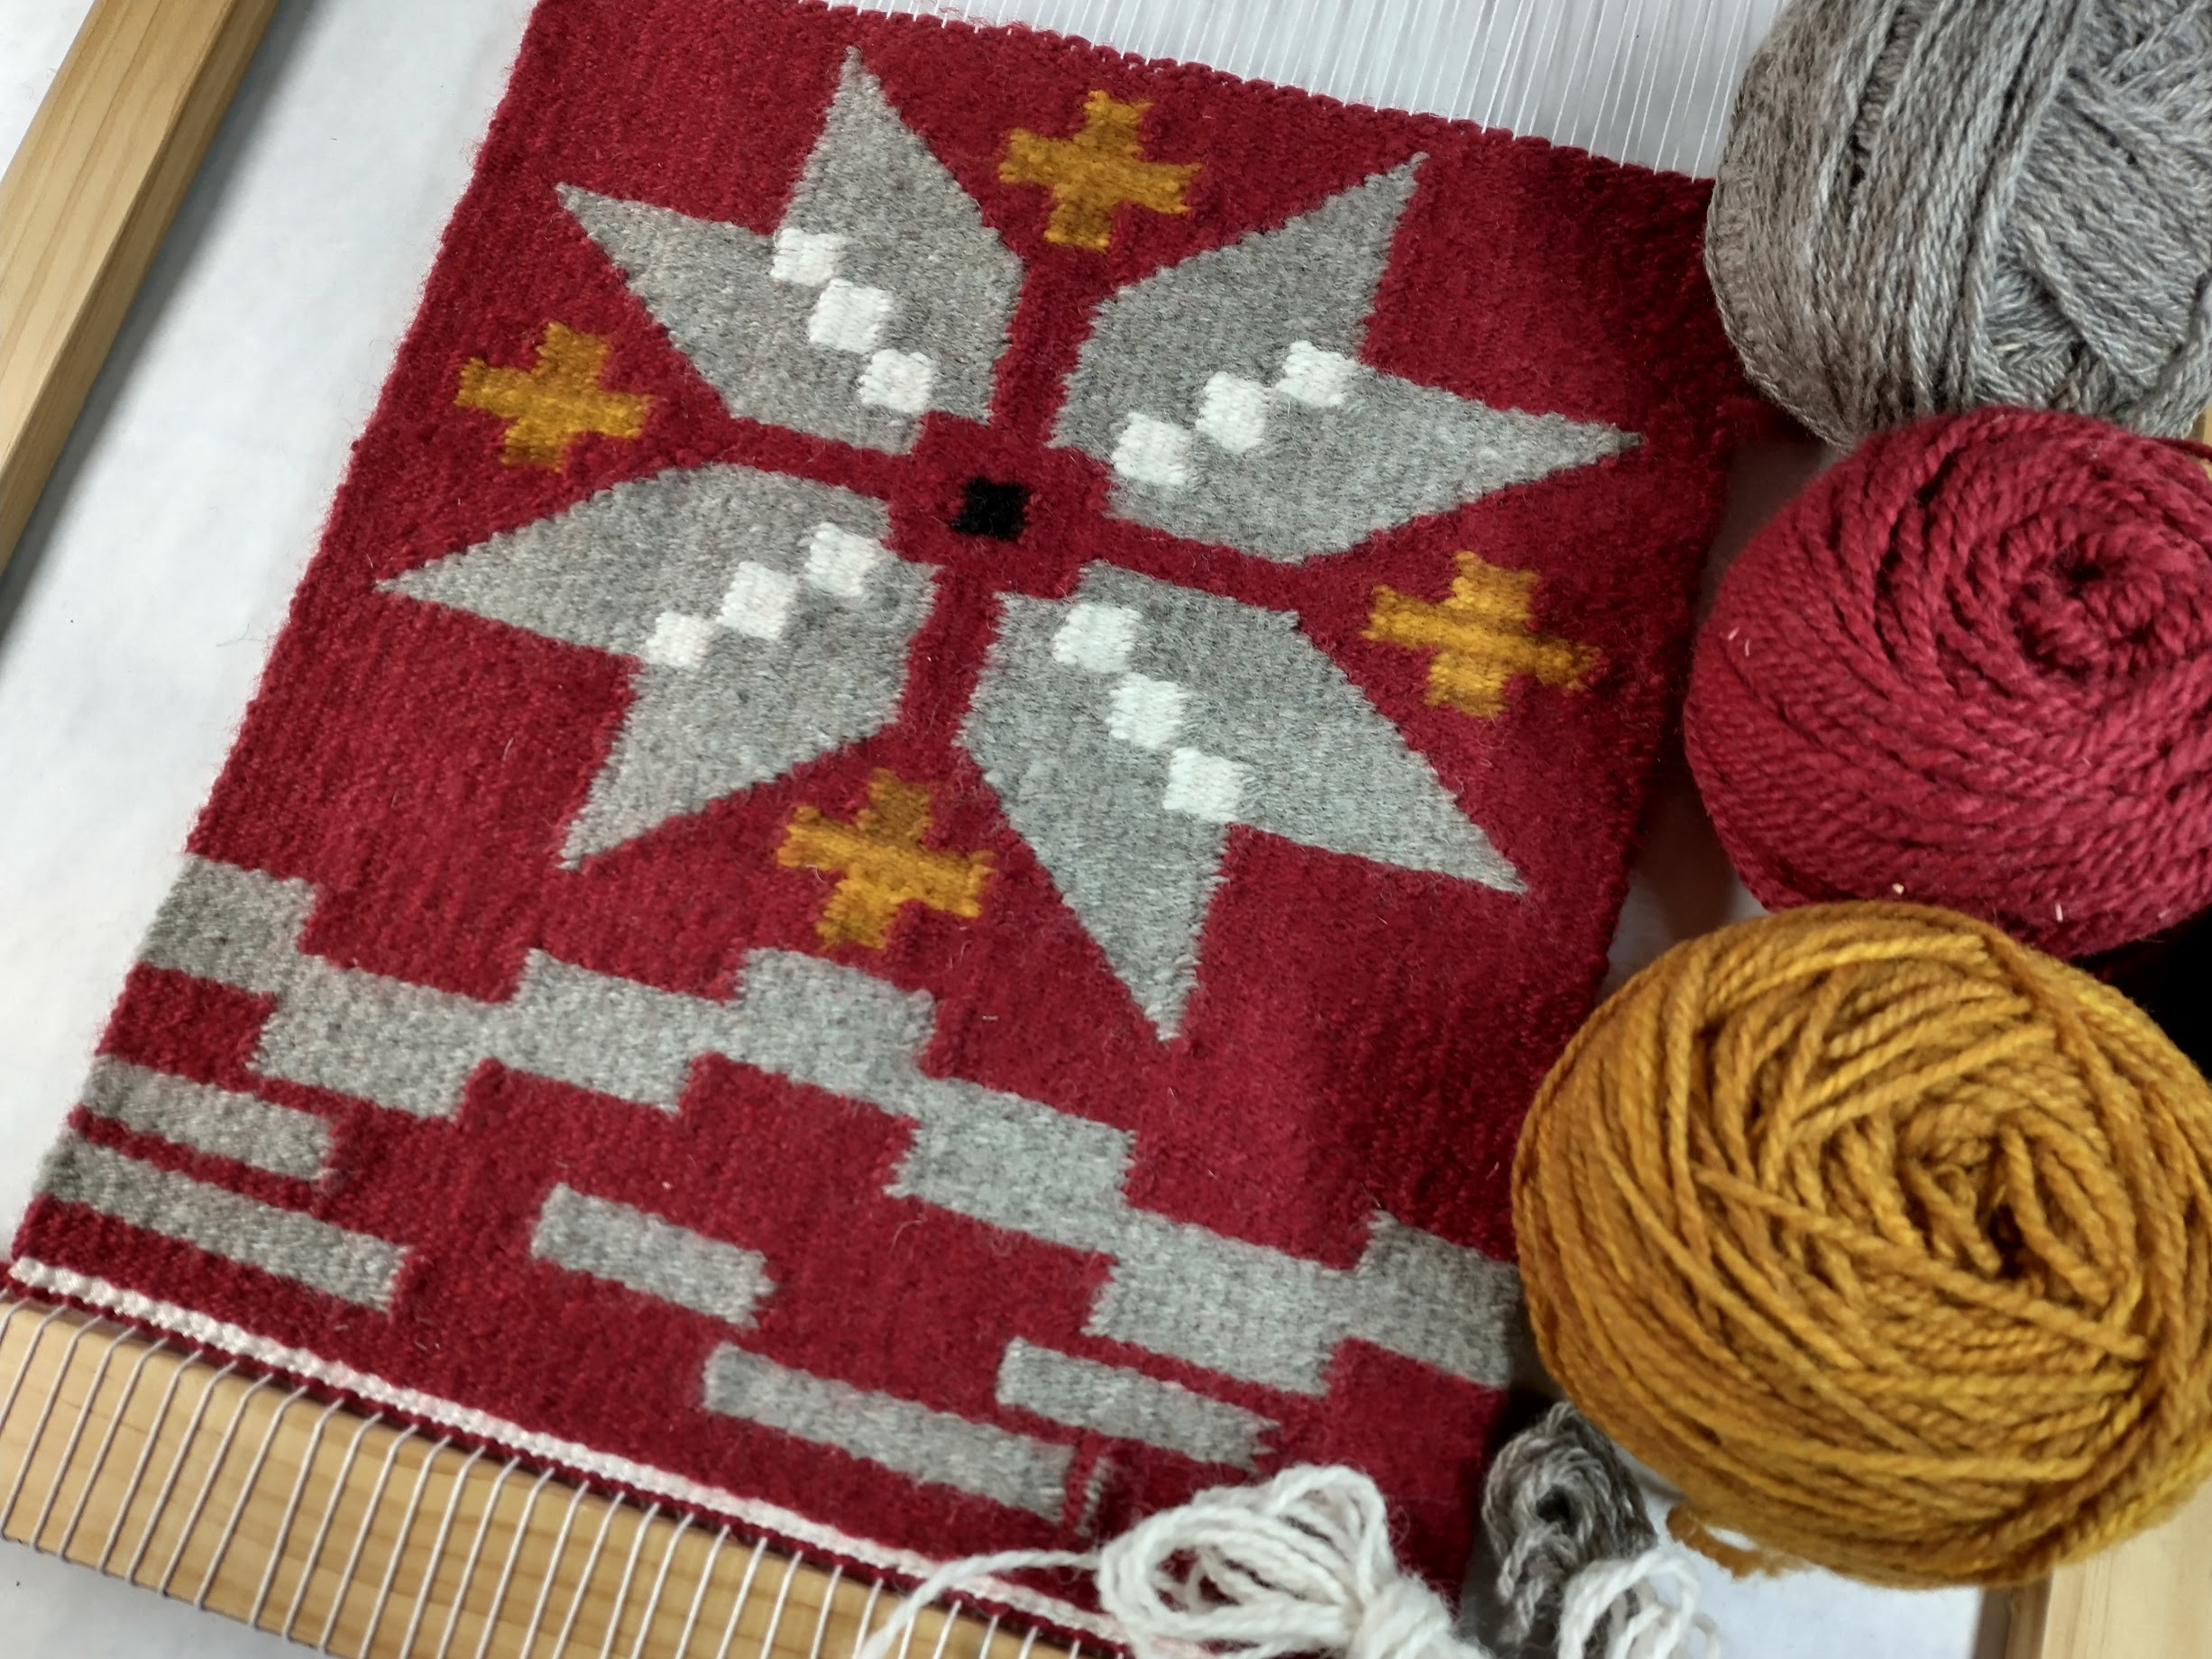 tapestry level 2